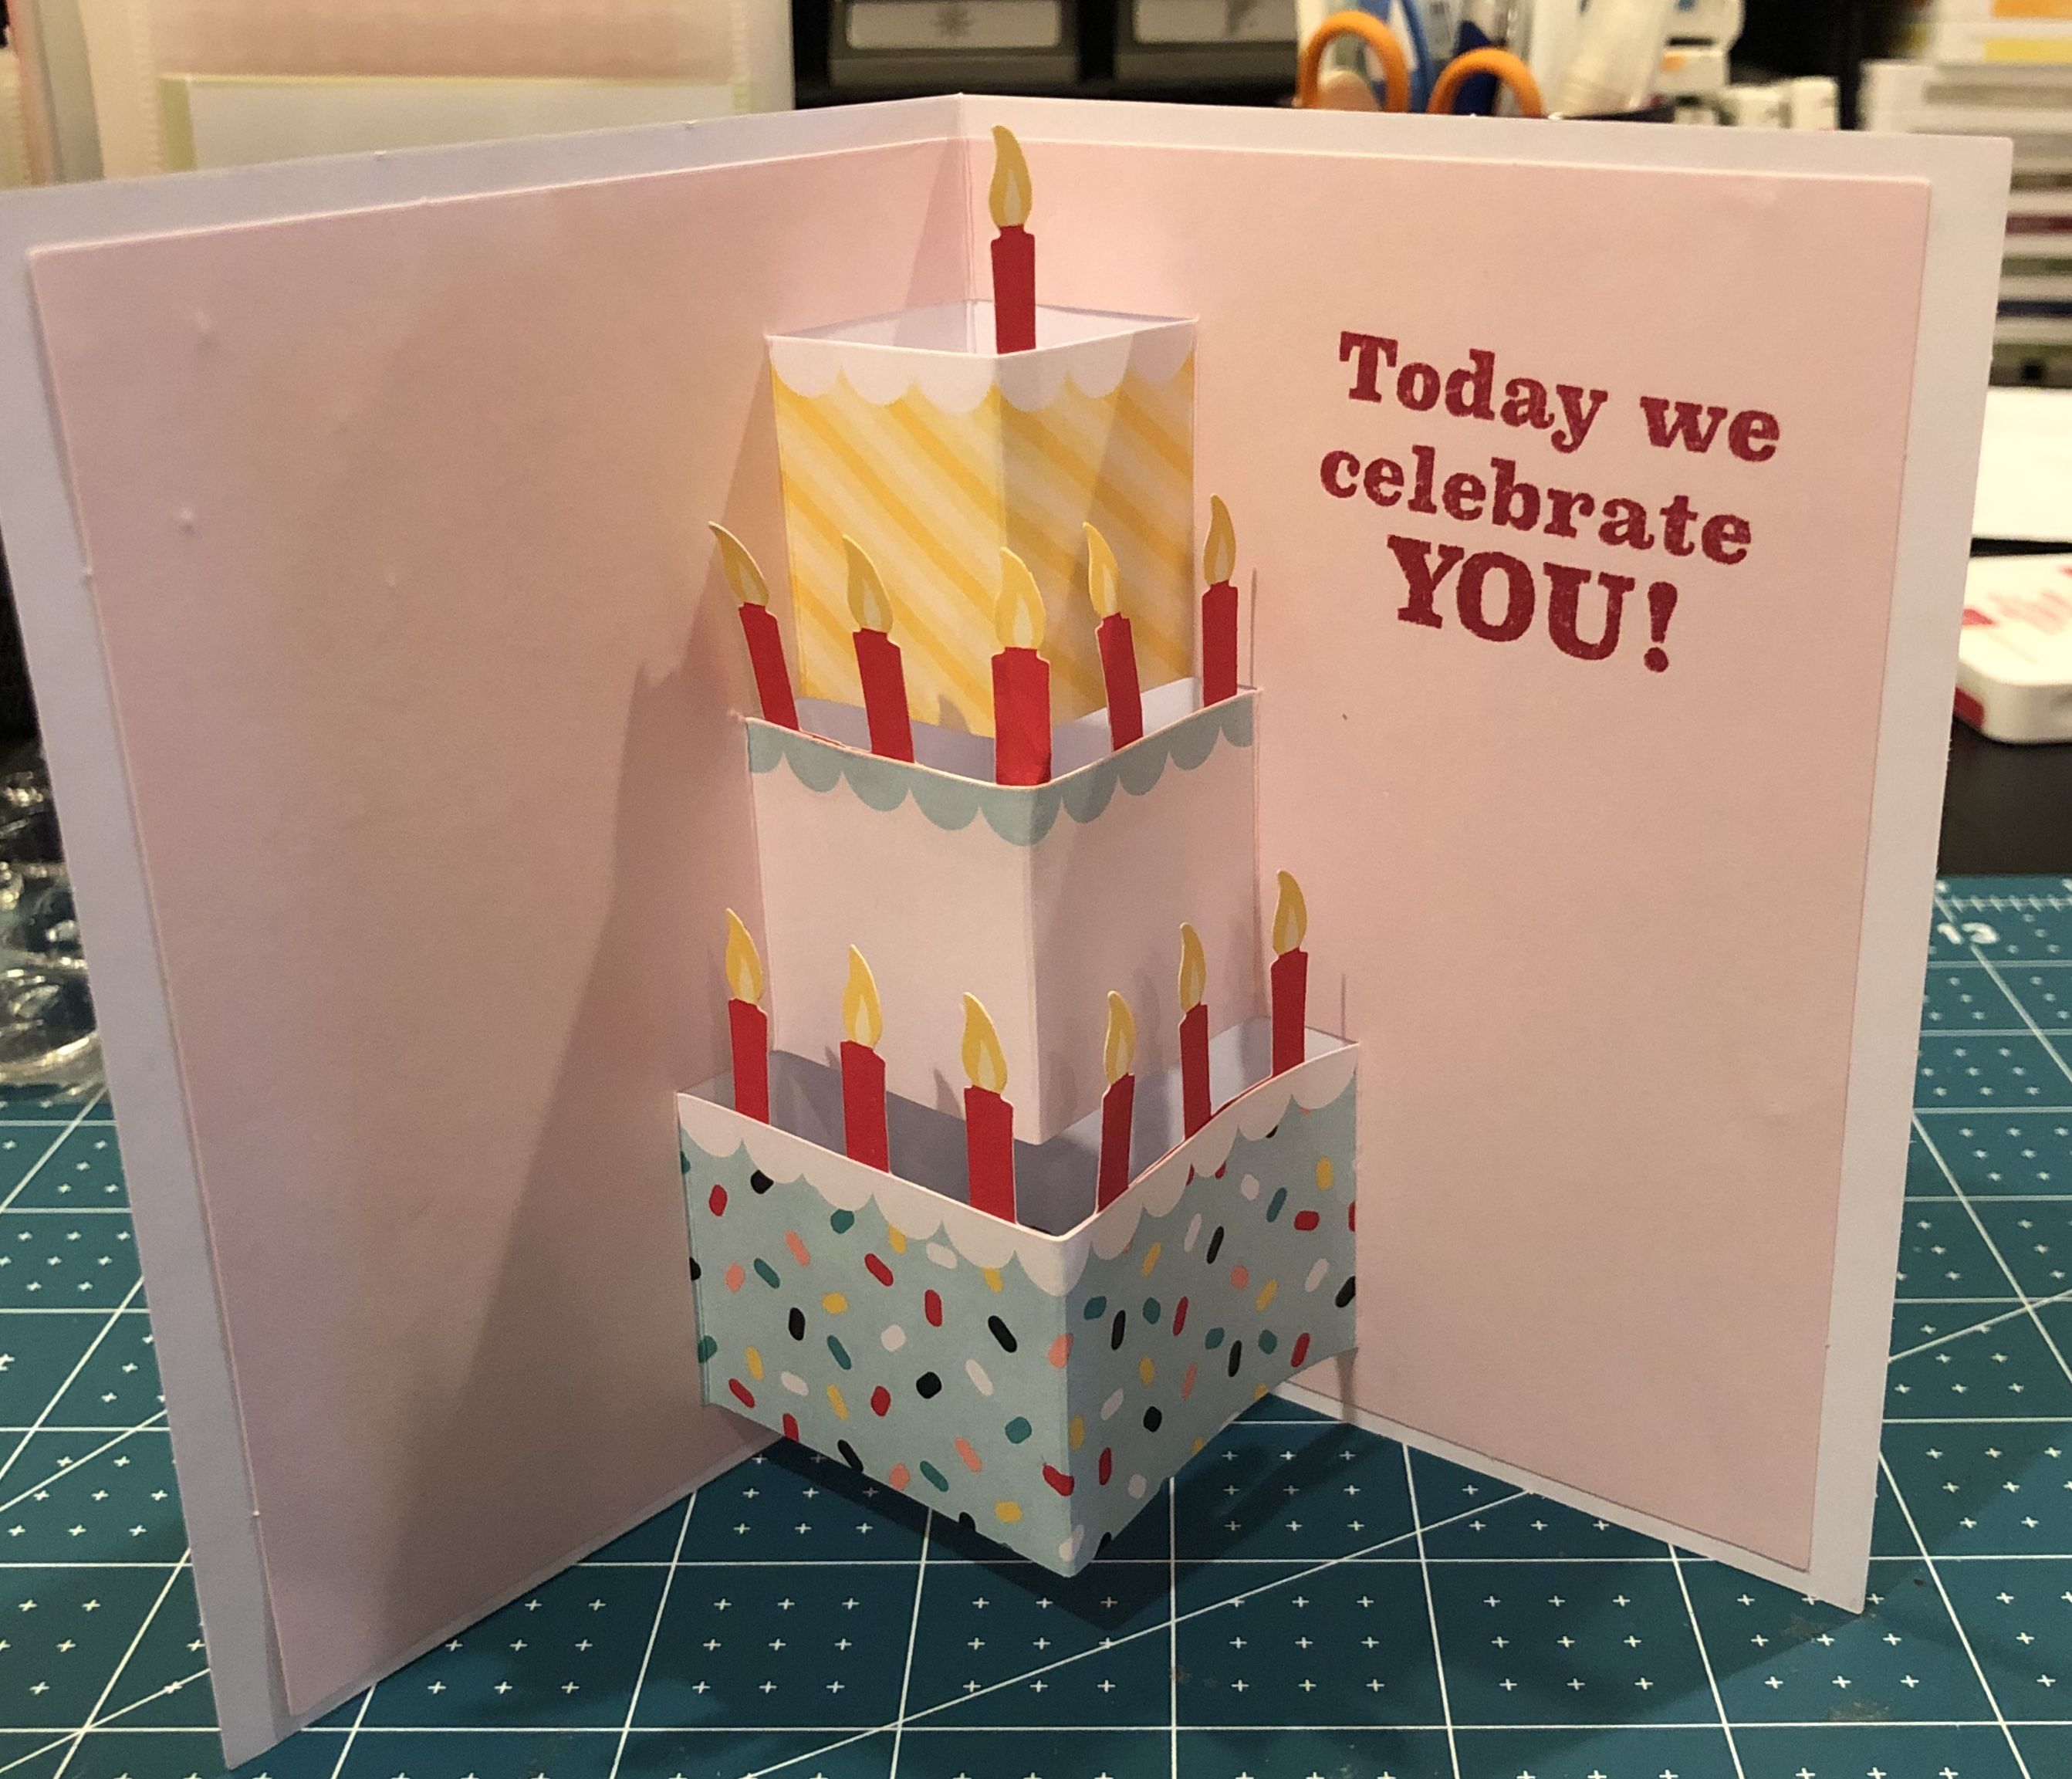 Inside if grandsons birthday card i plan on putting